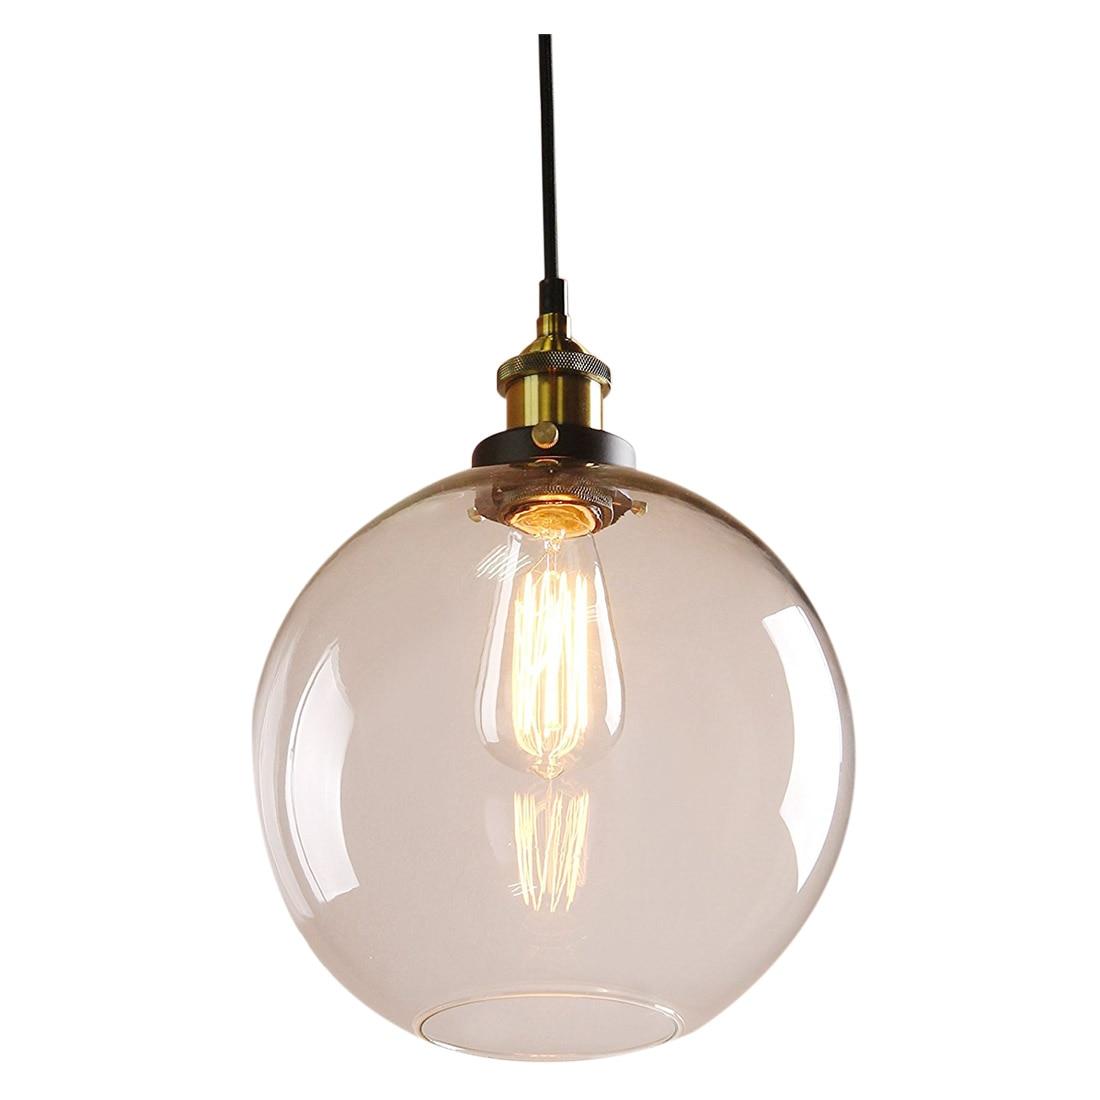 купить DSHA Hot Sale Modern Industrial Metal Glass Loft Pendant Lamp Retro Vintage Lamp(Antique head diameter 25cm) недорого